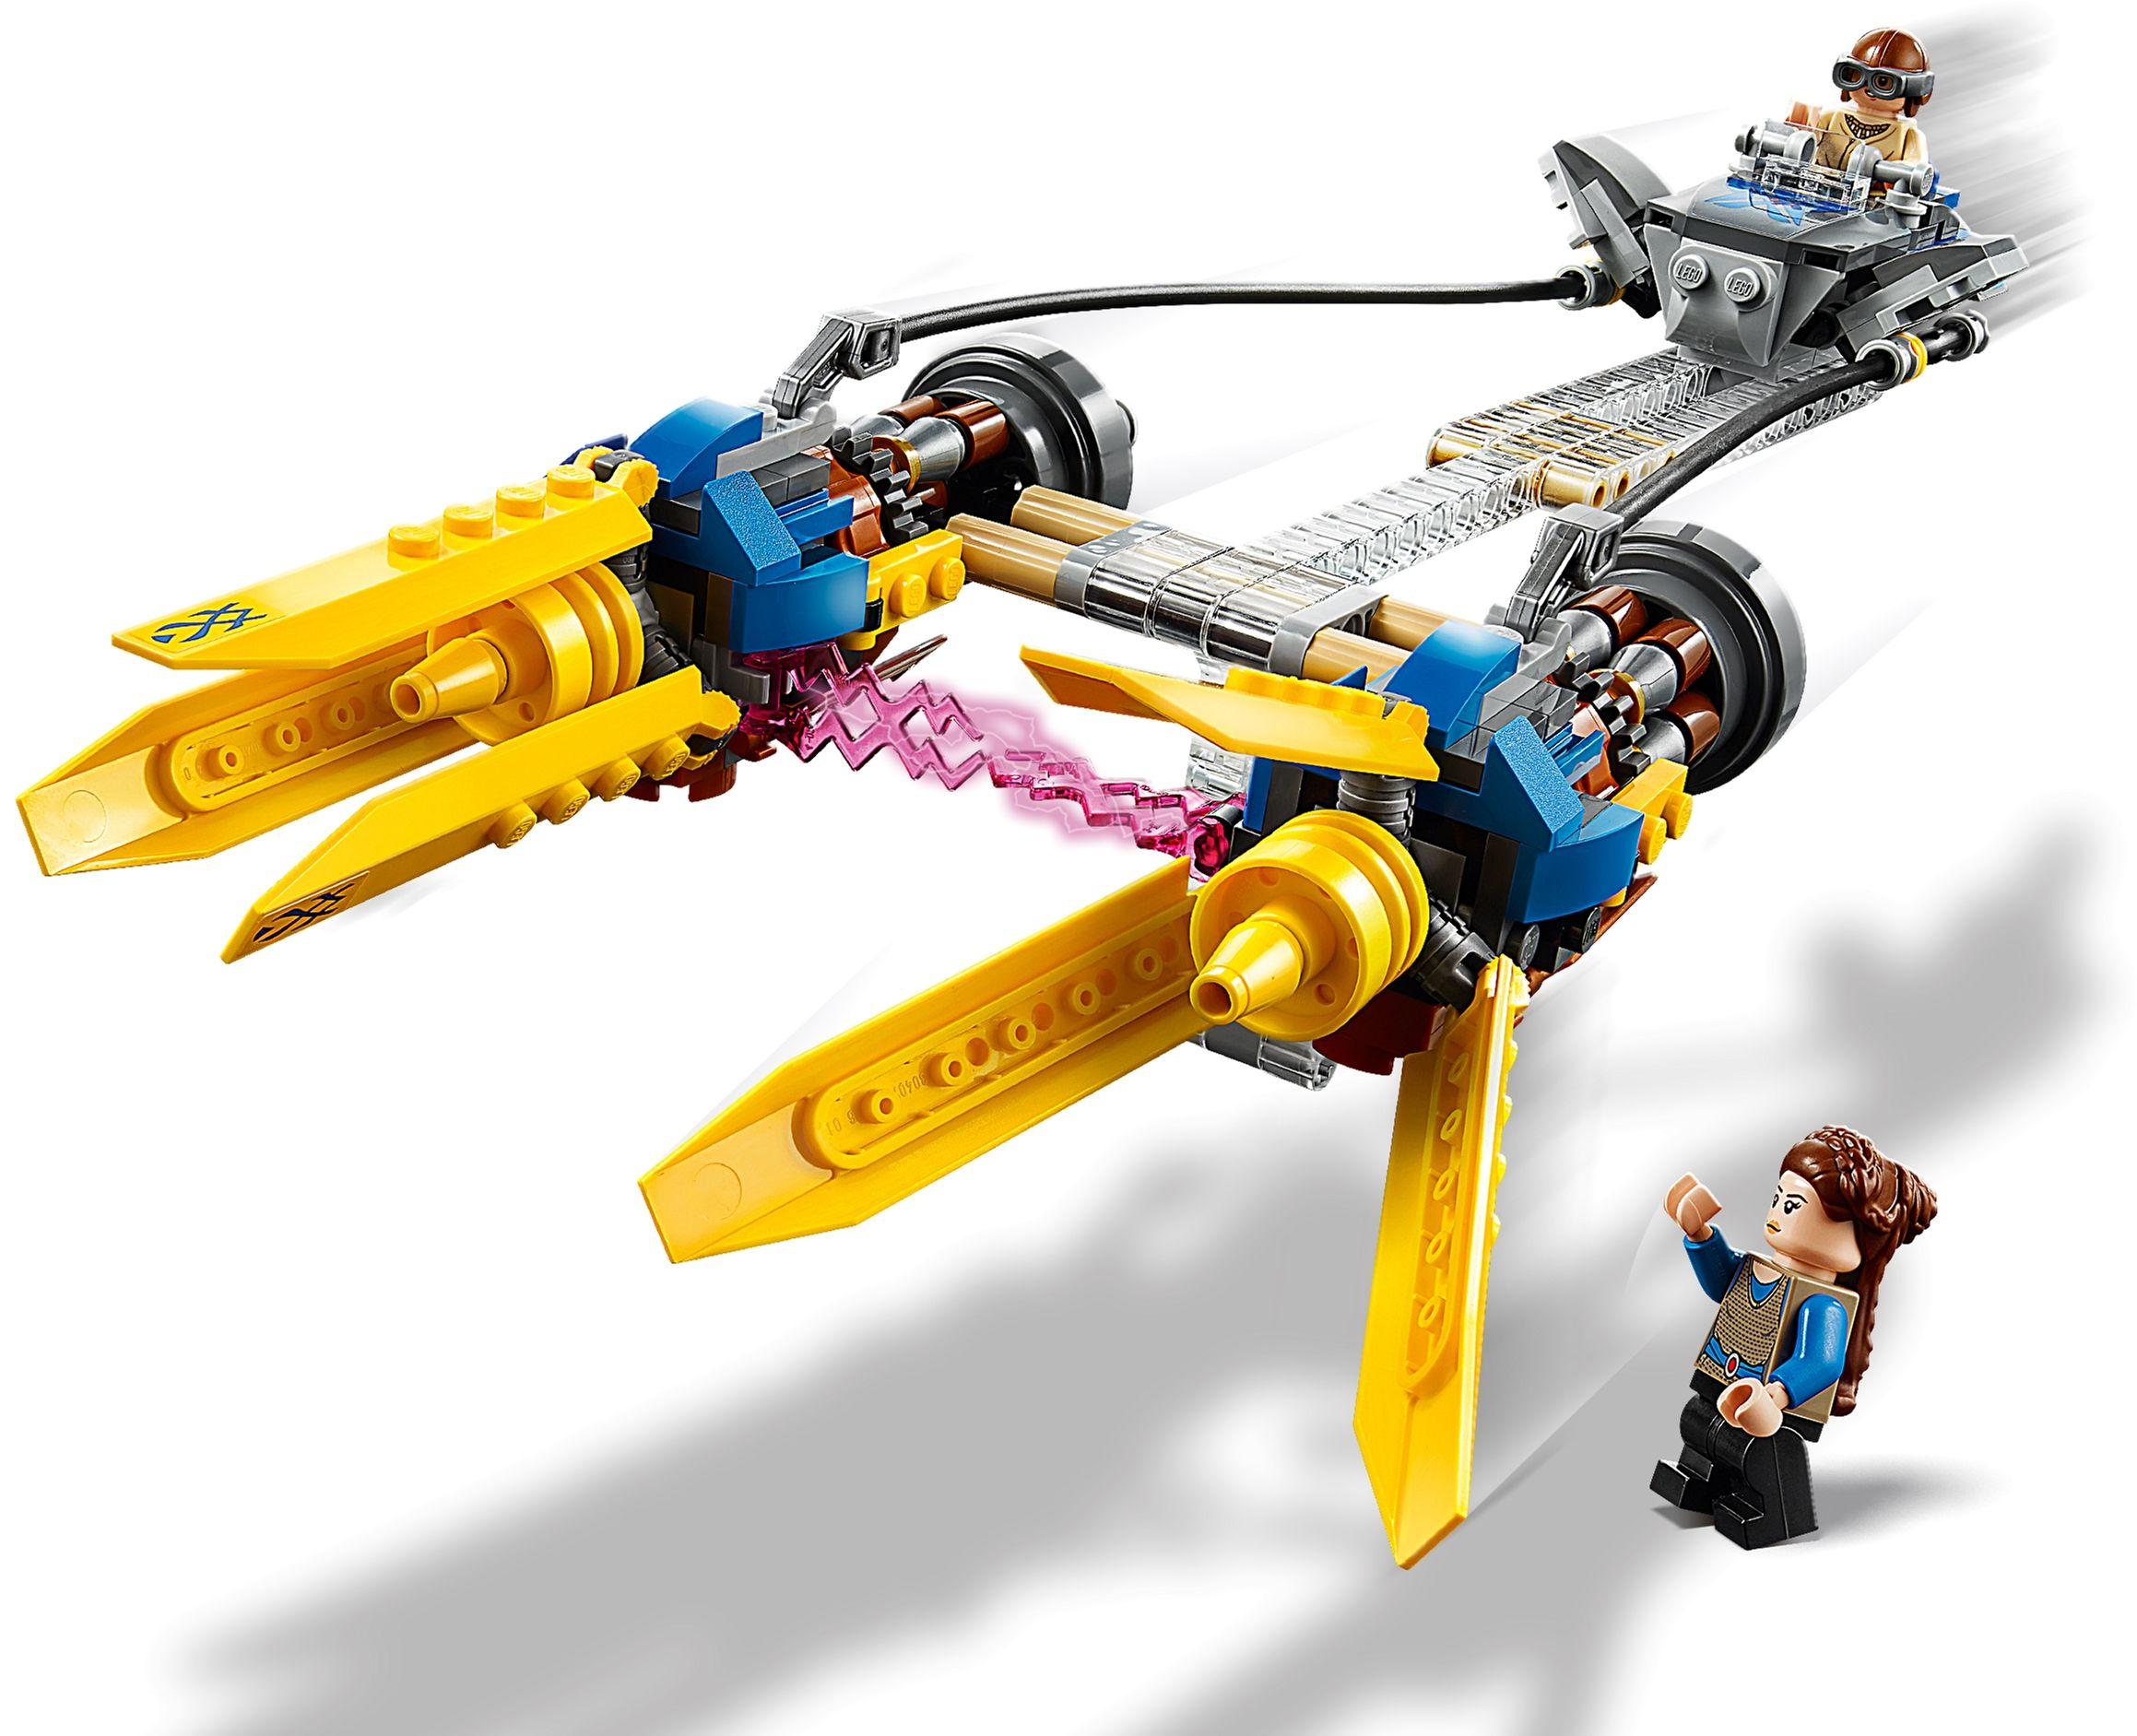 Конструктор Lego Star Wars -  Anakin's Podracer (75258) - 5